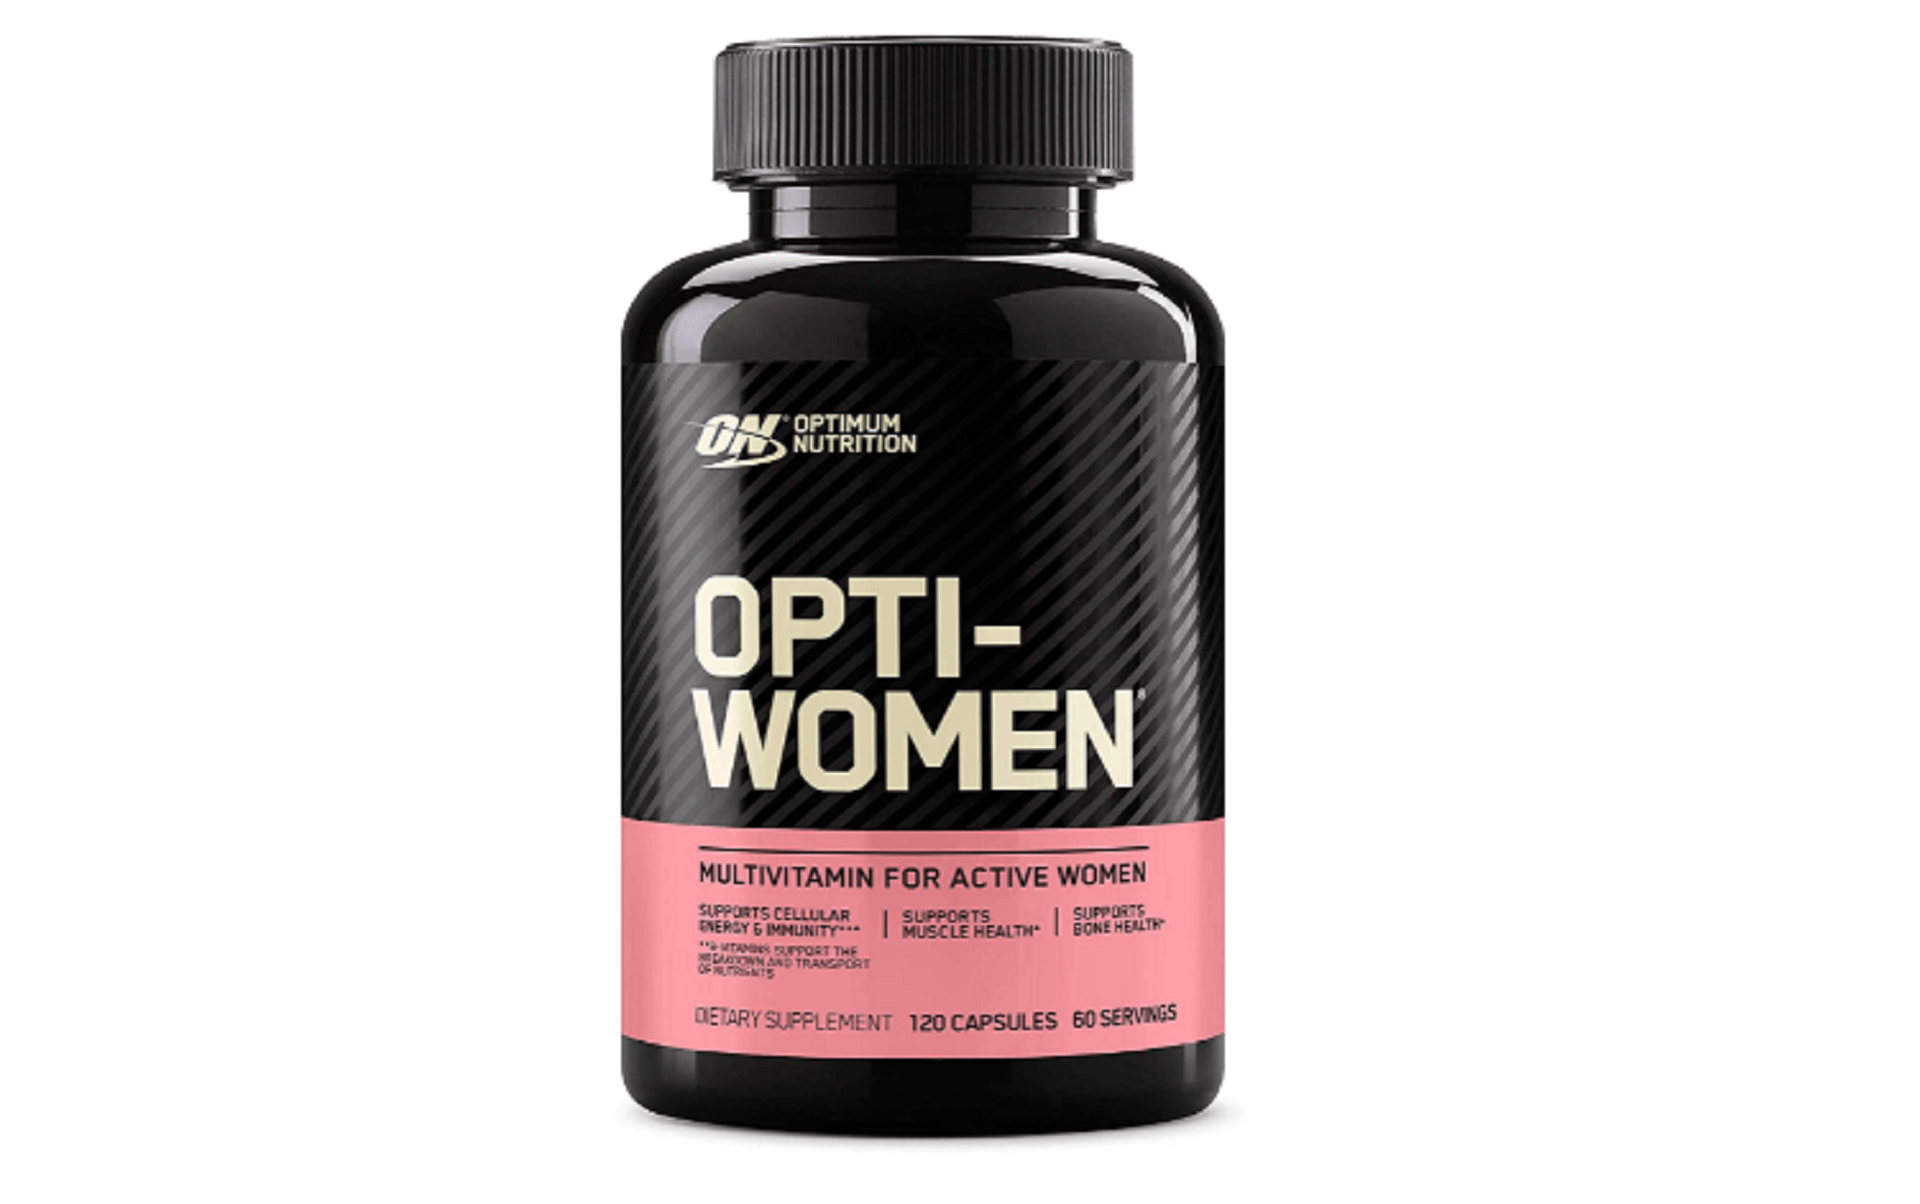 optimum nutrition opti- women